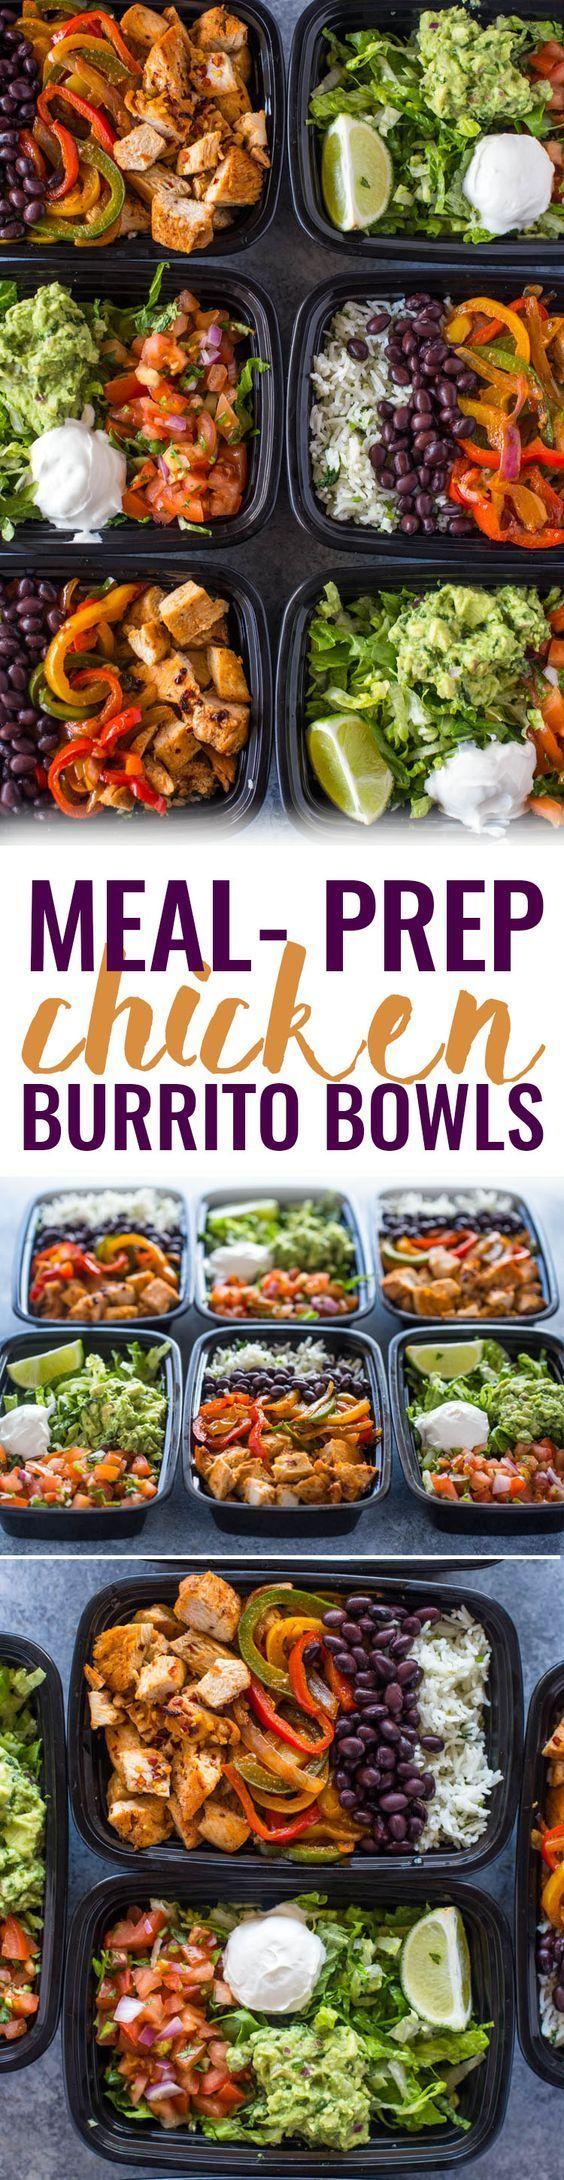 Chicken Burrito Bowls #protein #mealprep #organize